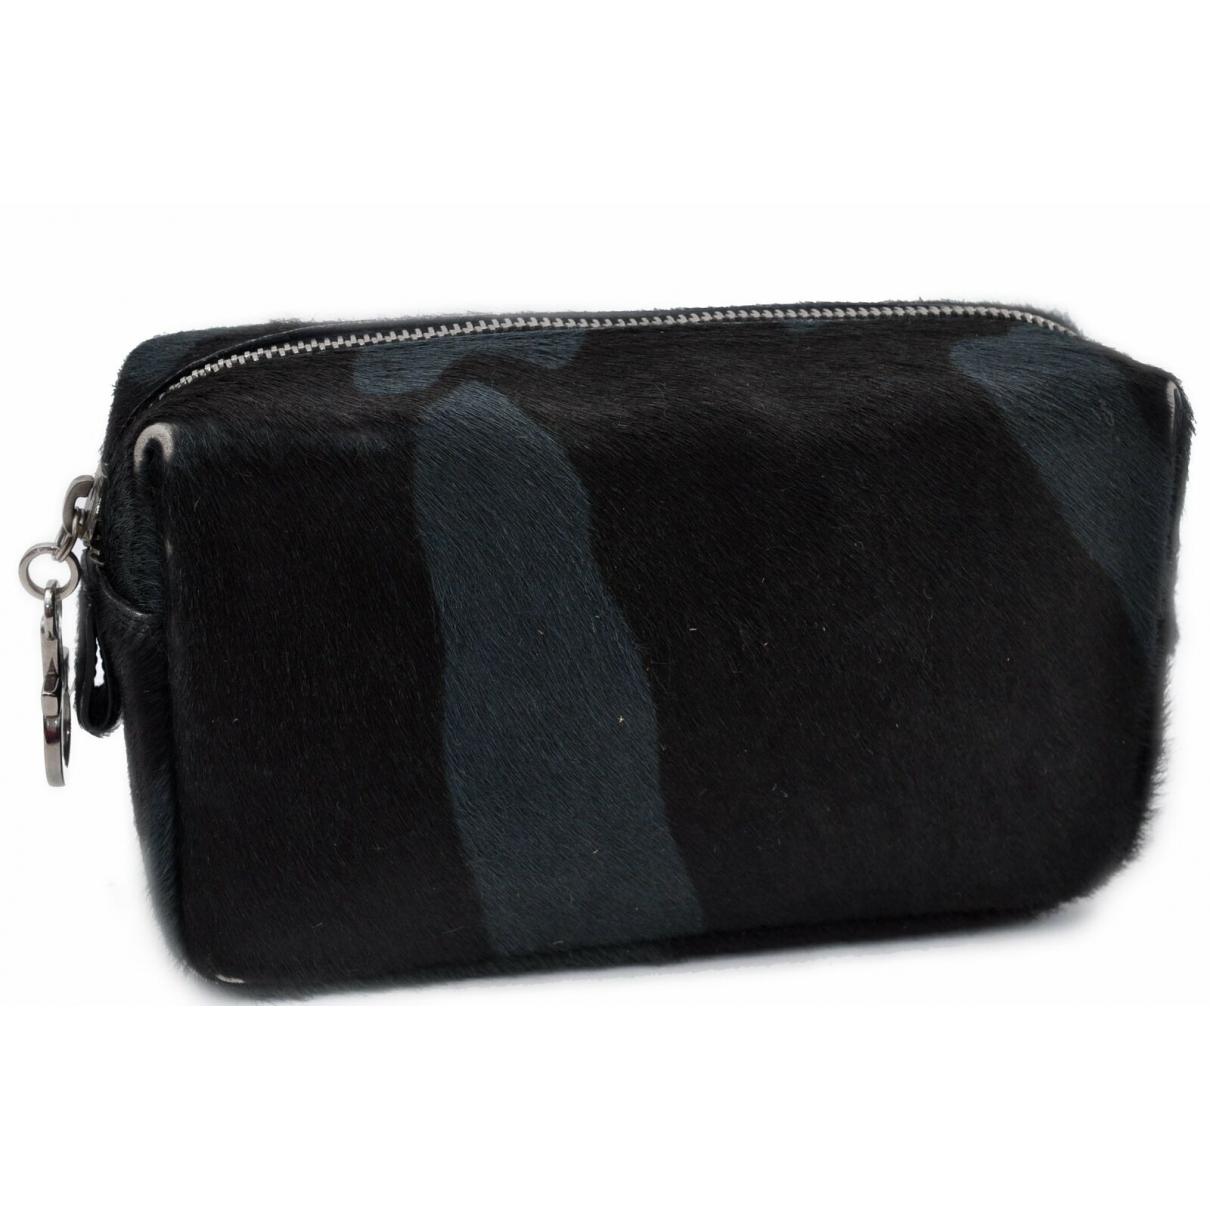 Salvatore Ferragamo \N Black Pony-style calfskin Travel bag for Women \N